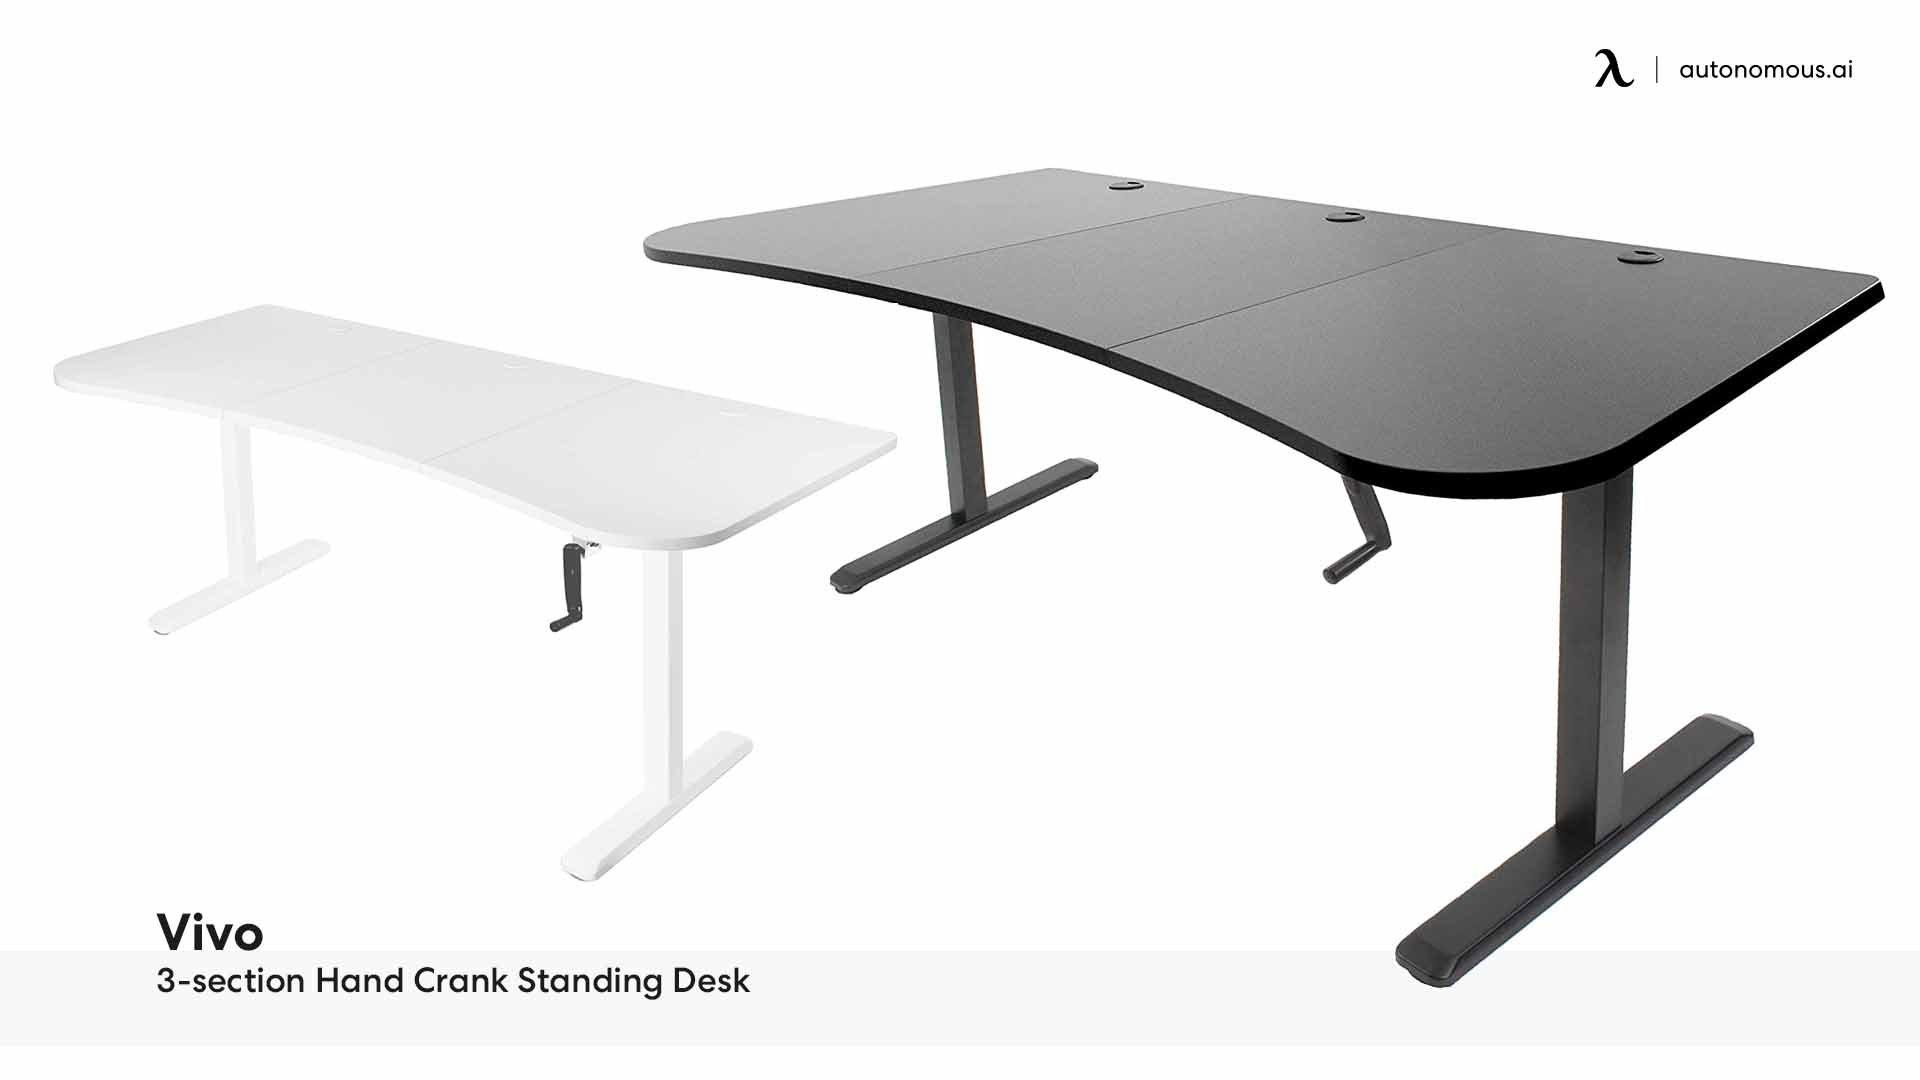 Vivo Three-section Hand Crank Standing Desk